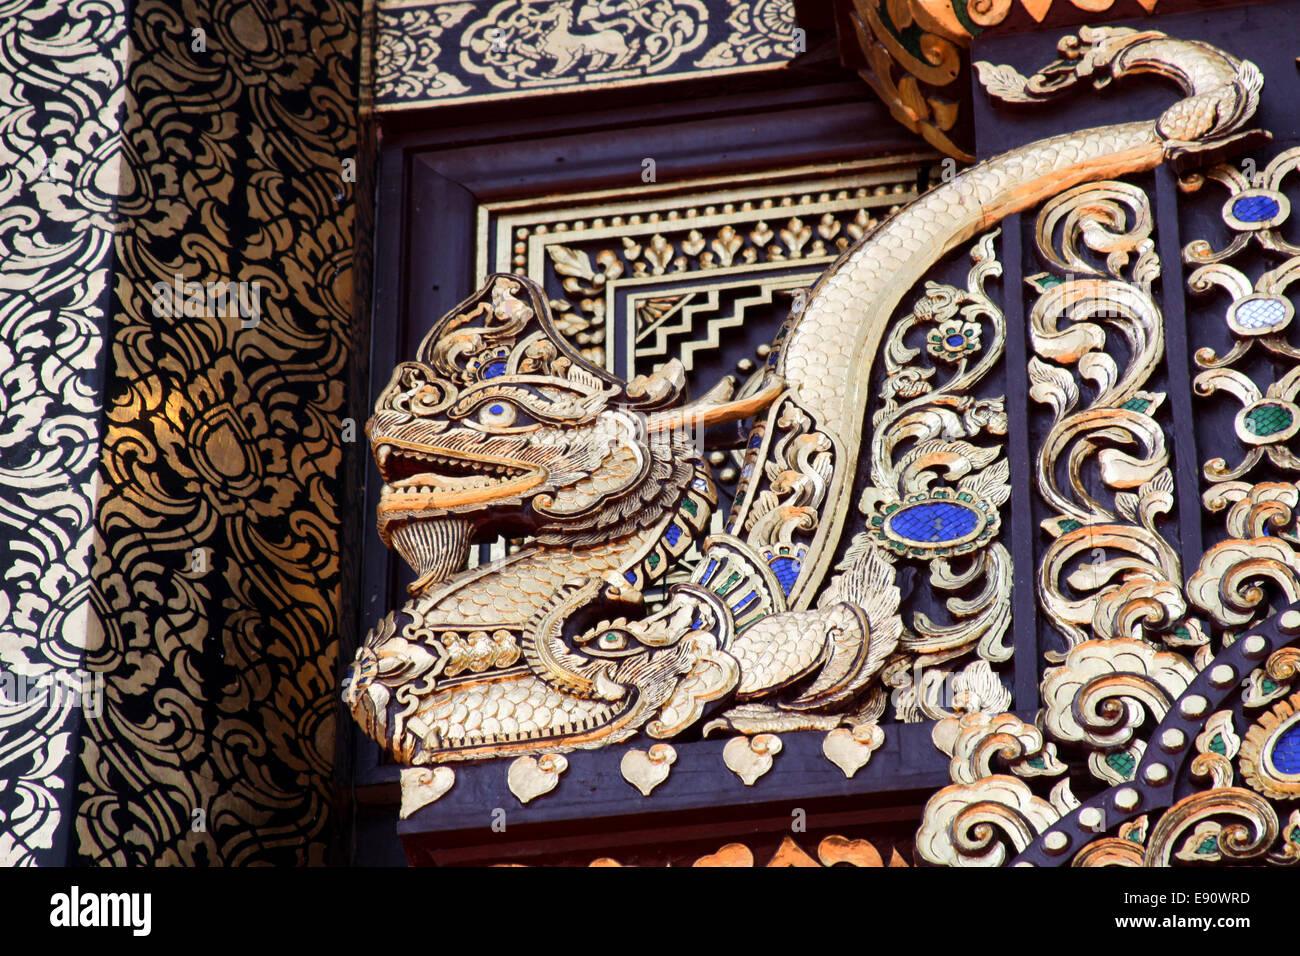 Dragon - Thai Buddhist temple decoration - Stock Image